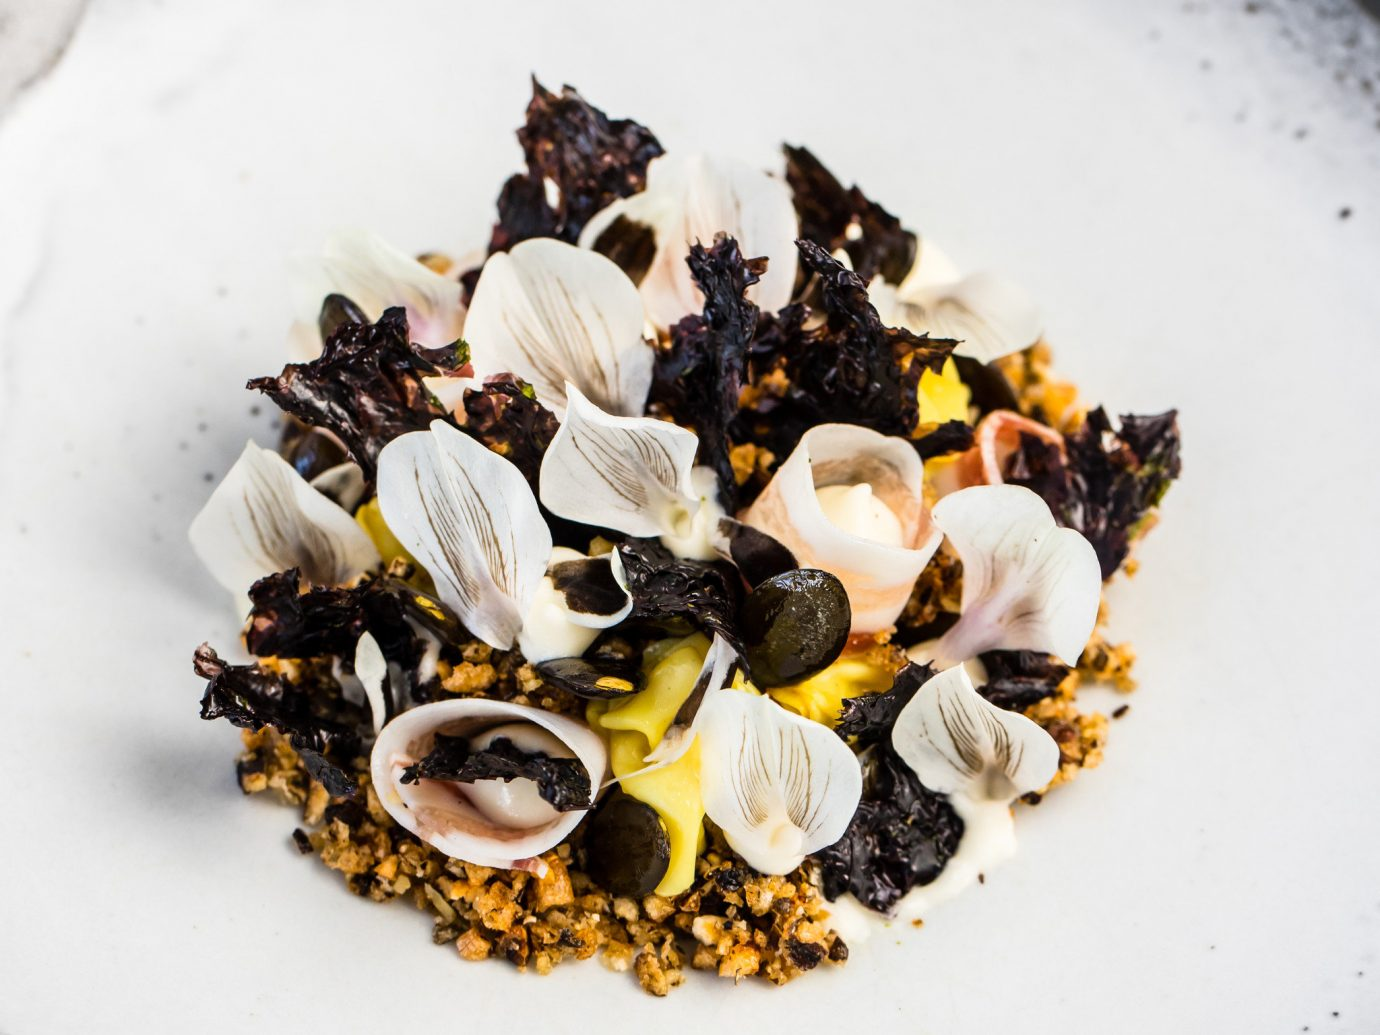 Trip Ideas plate food dish produce breakfast meal vegetable cuisine dessert cream